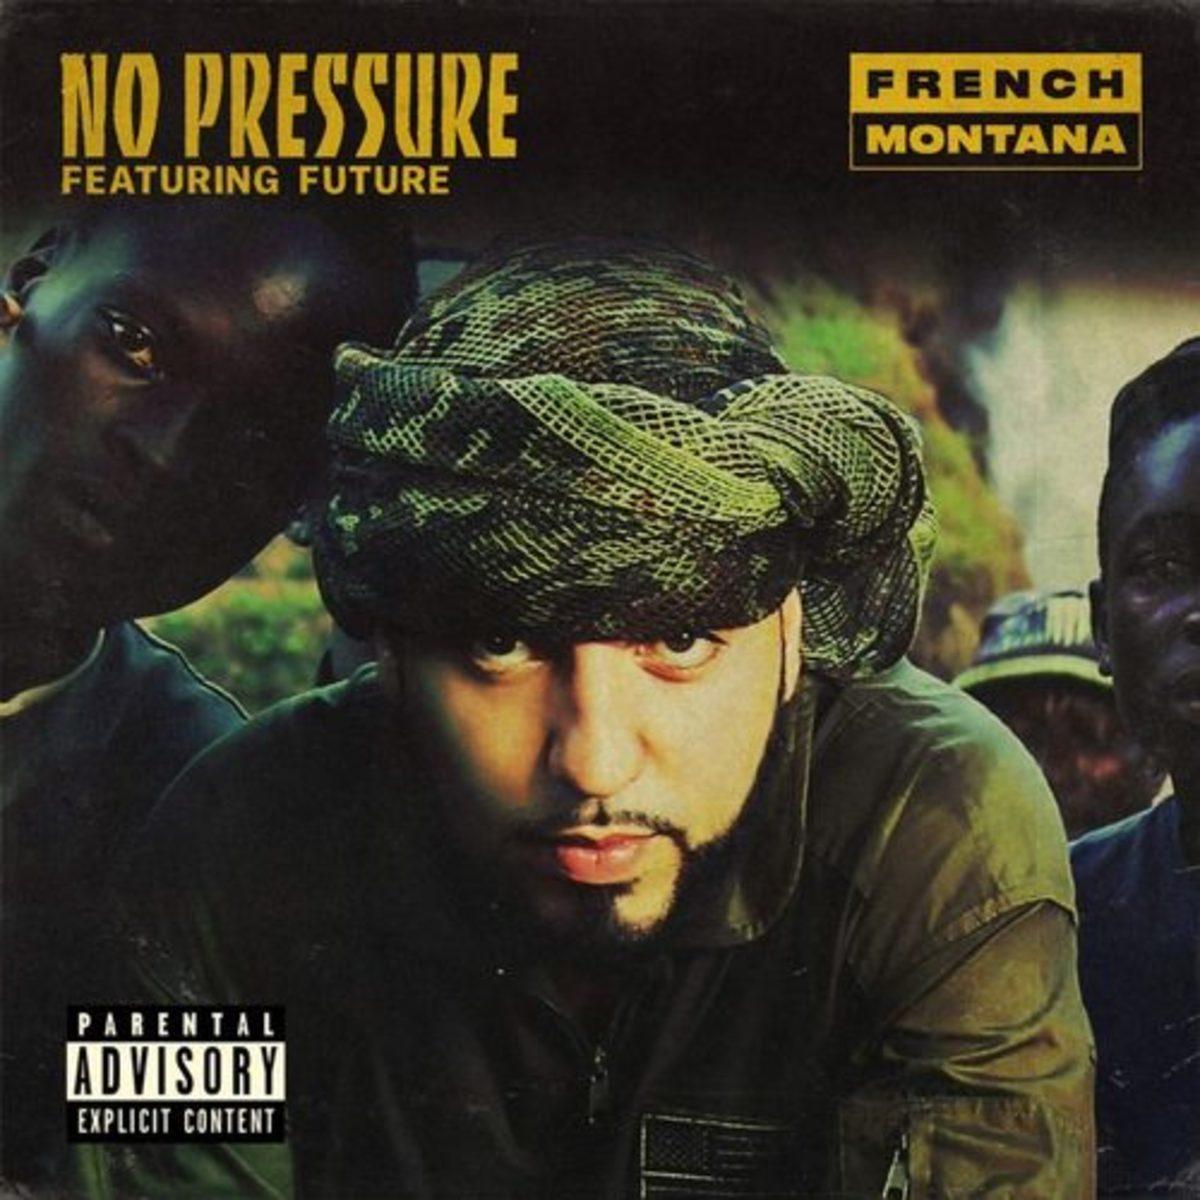 french-montana-no-pressure.jpg